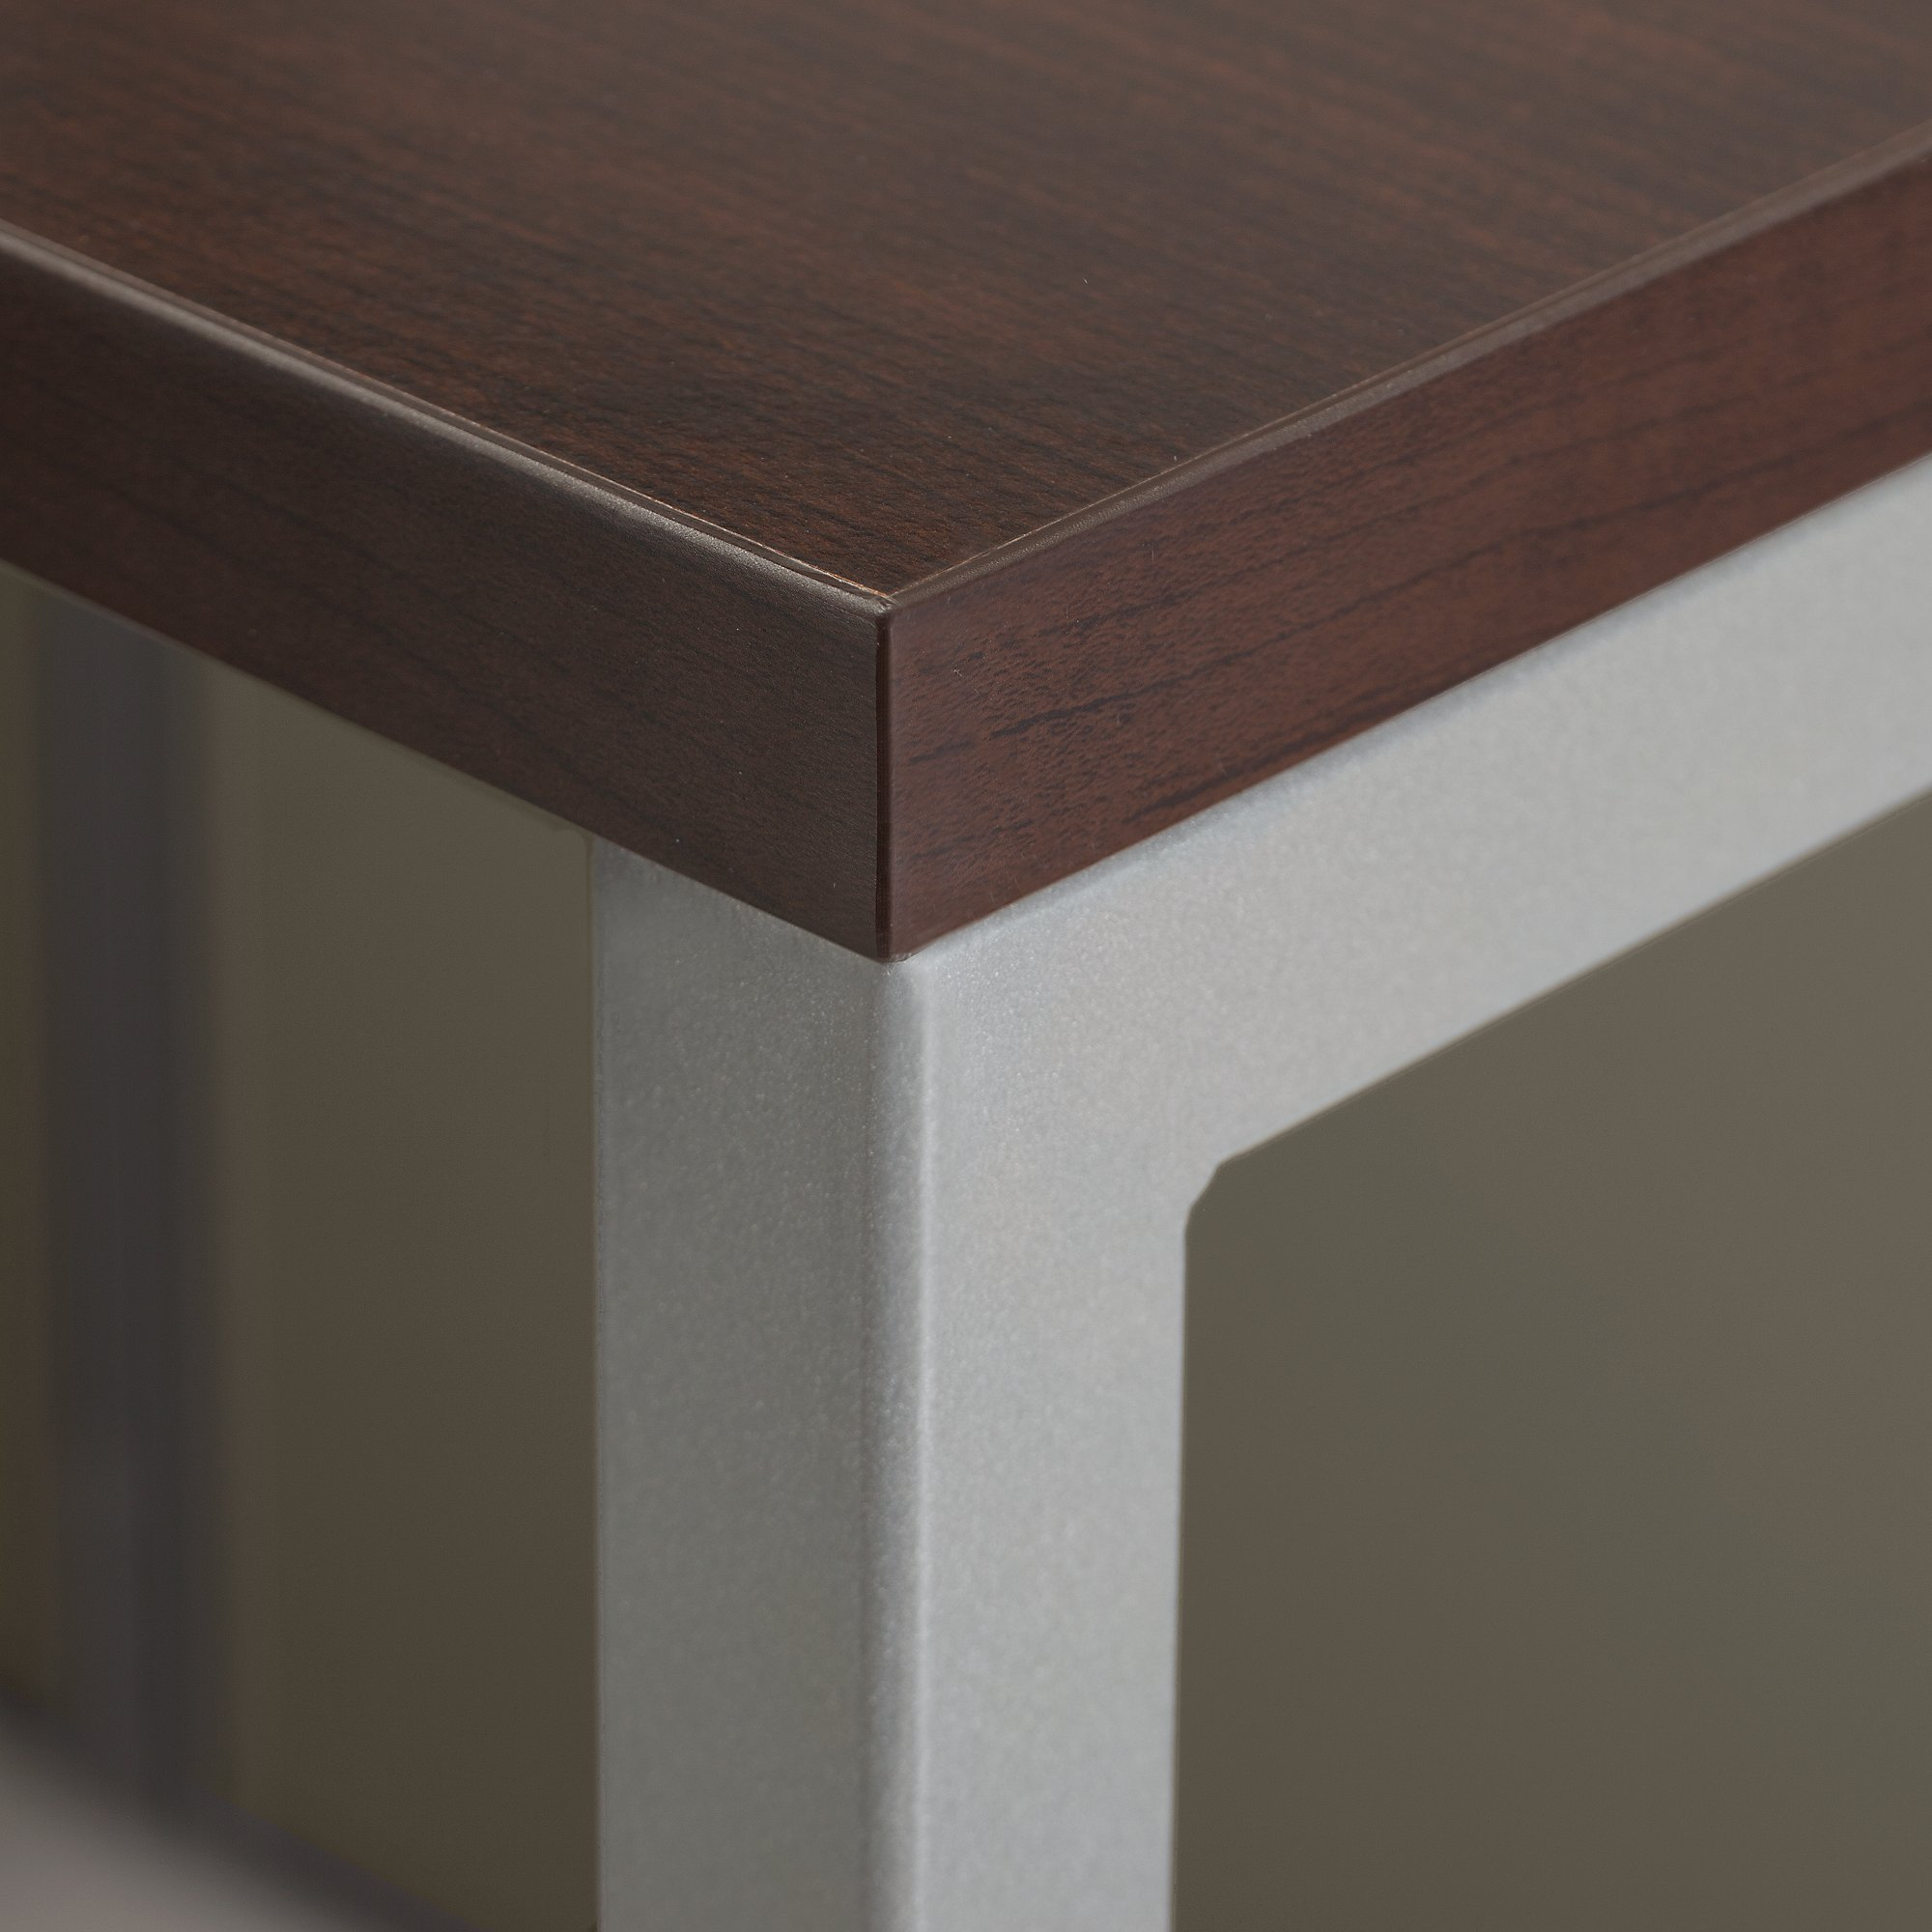 desk surface and frame